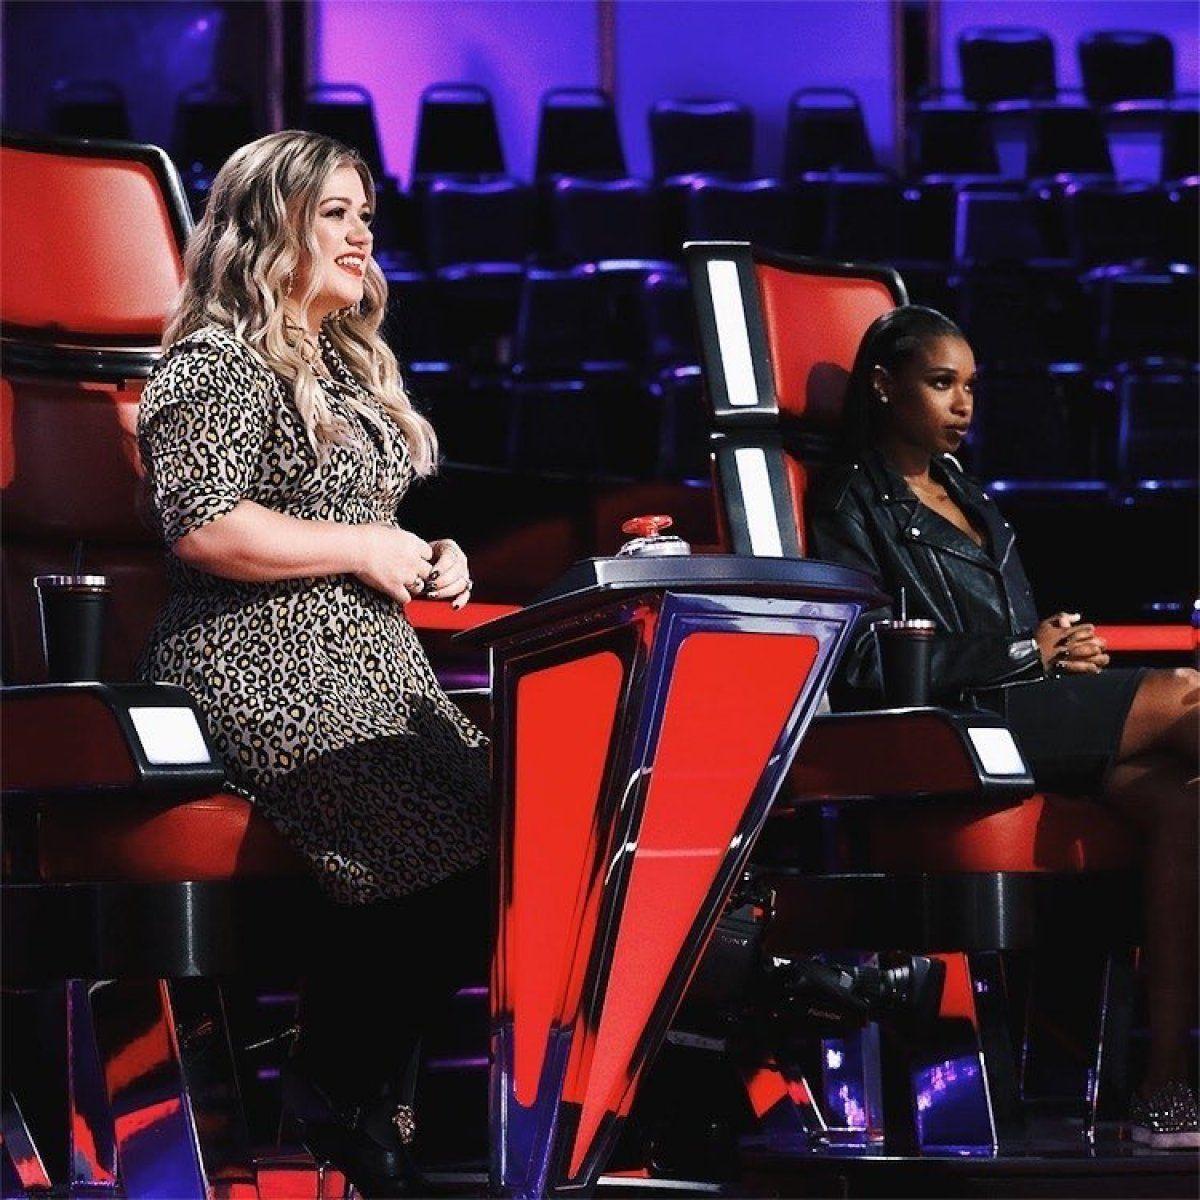 The Voice Announces Season 15 Coaches Jennifer Hudson And Kelly Clarkson Returning Jennifer Hudson Kelly Clarkson The Voice